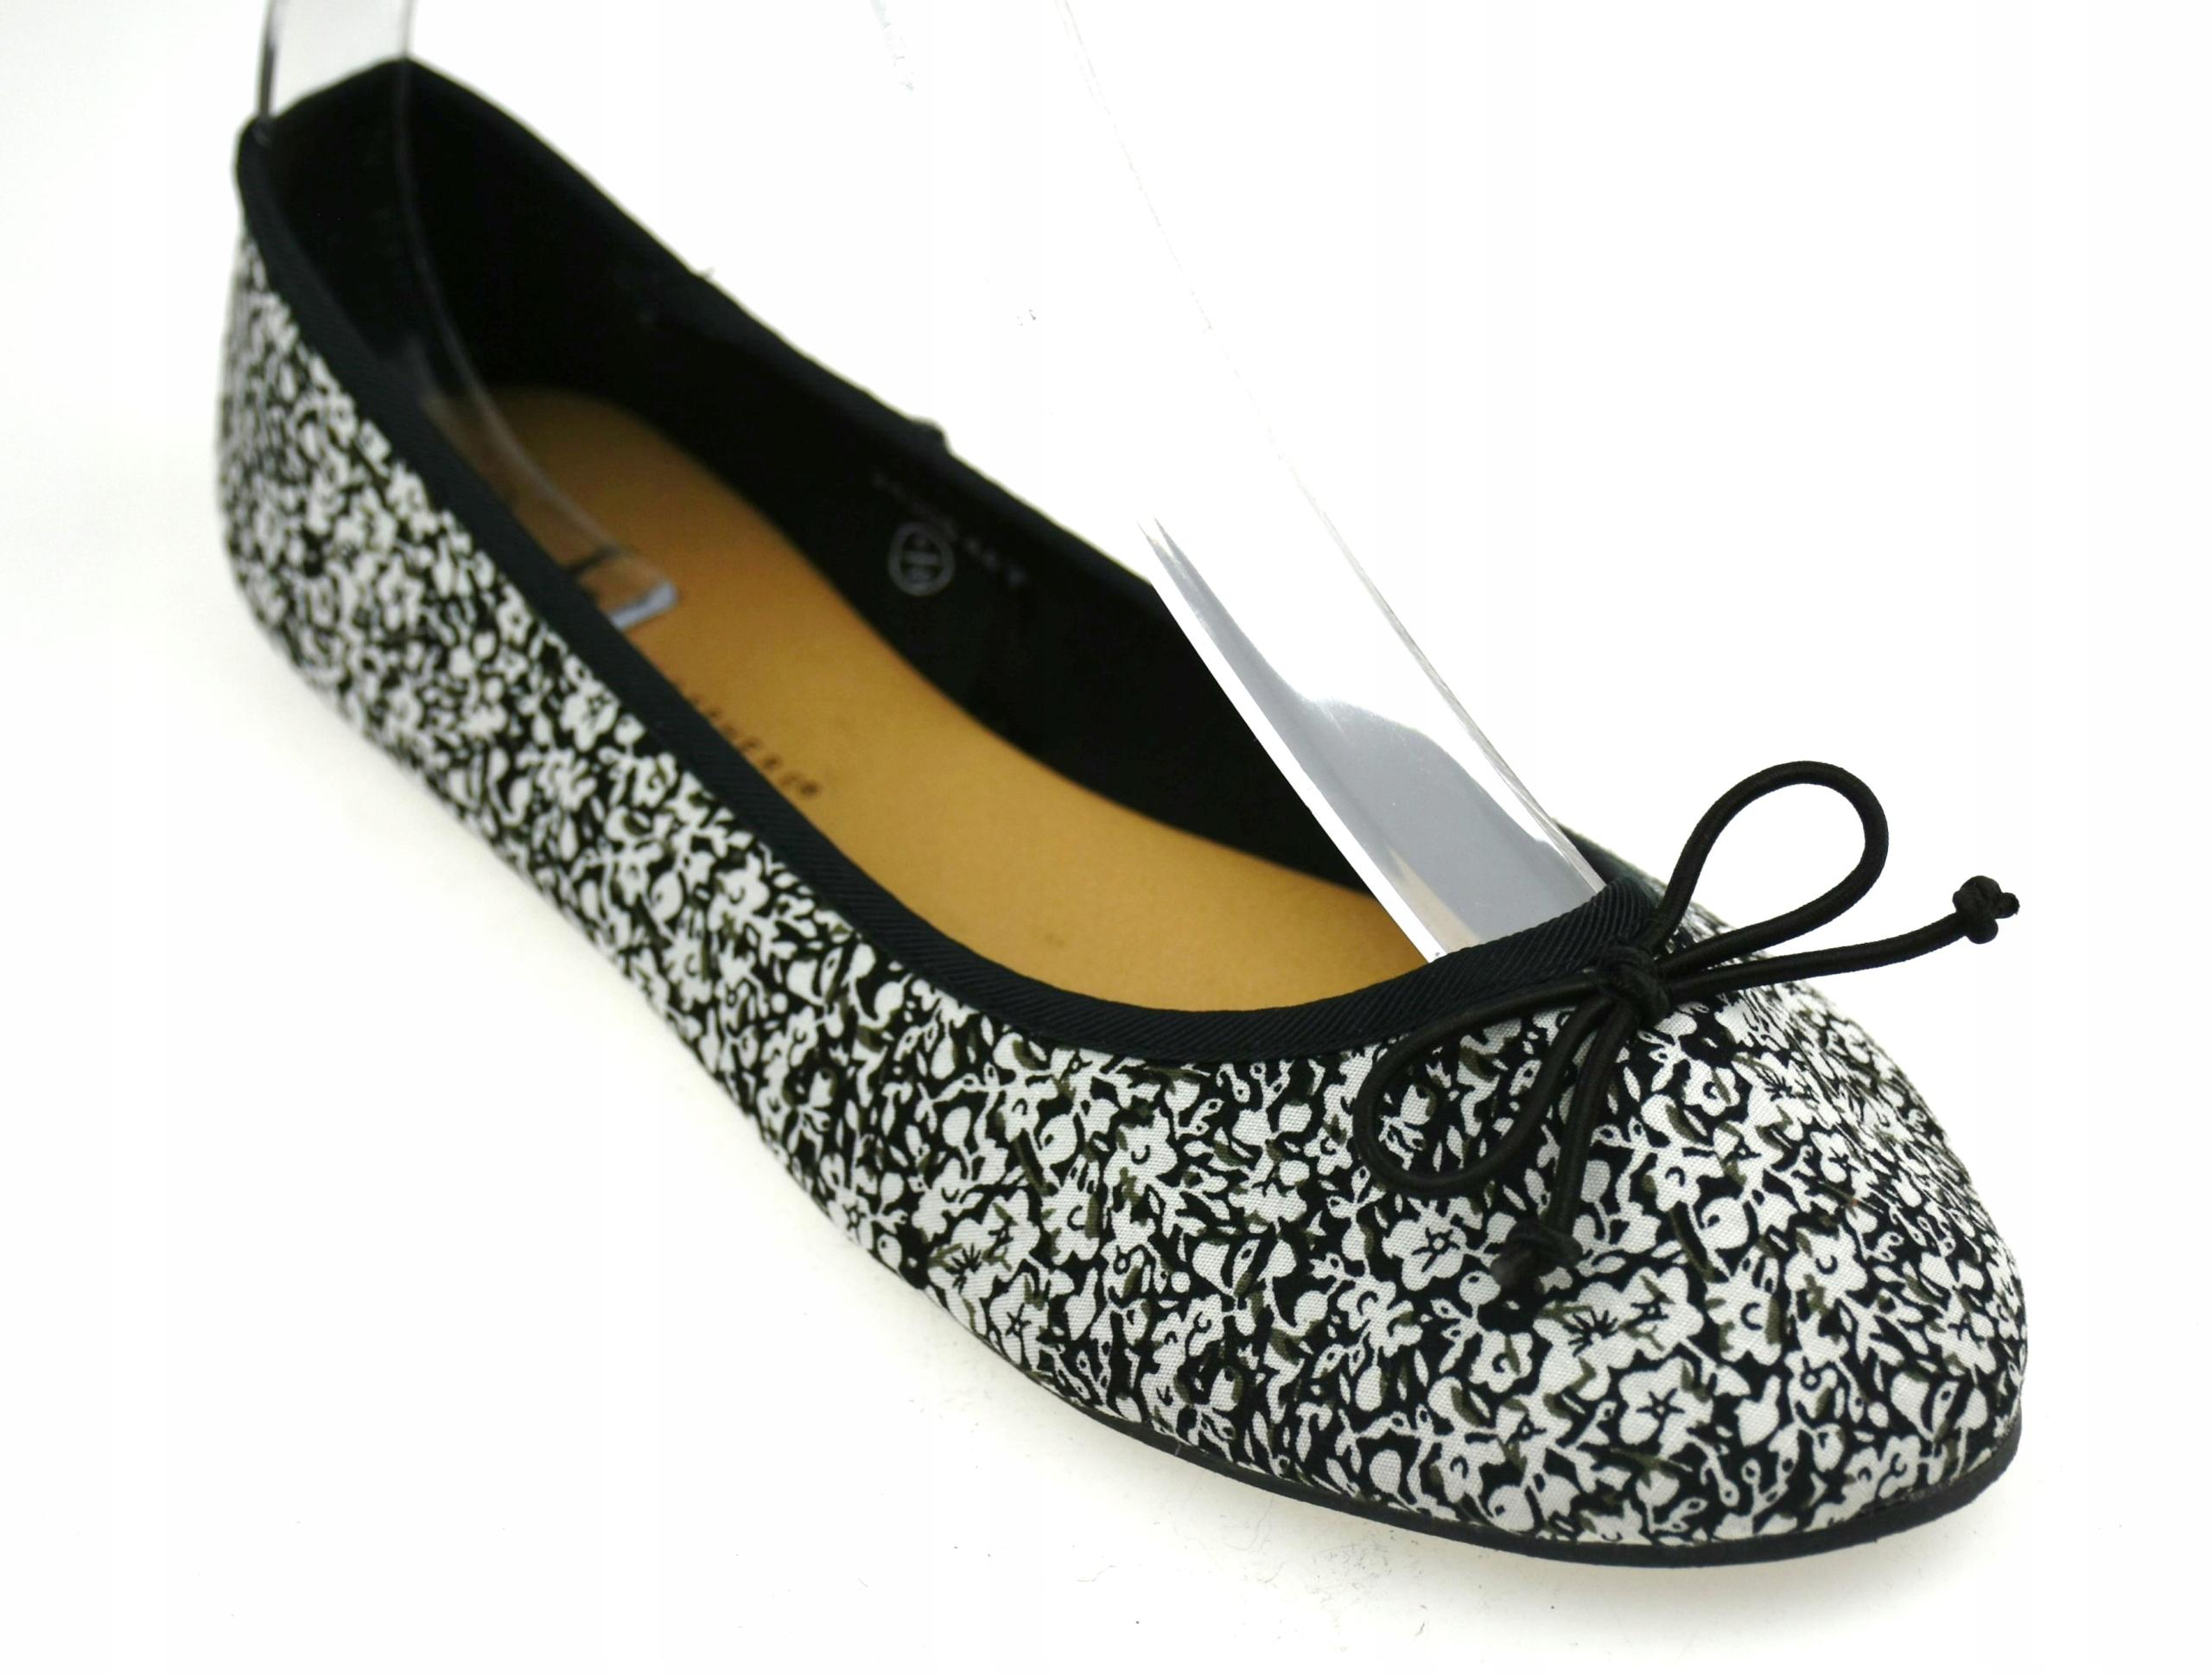 ATMOSPHERE buty DAMSKIE balerinki kwiatowe 4S433